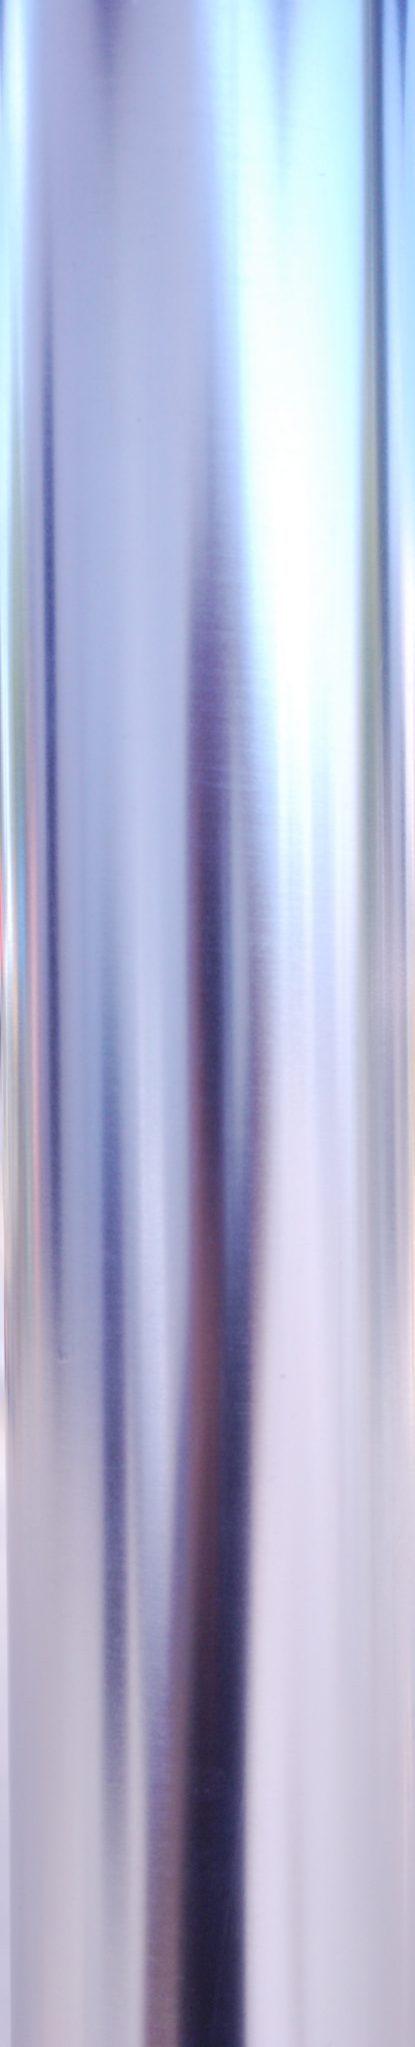 Galtech Silver Finish Pole